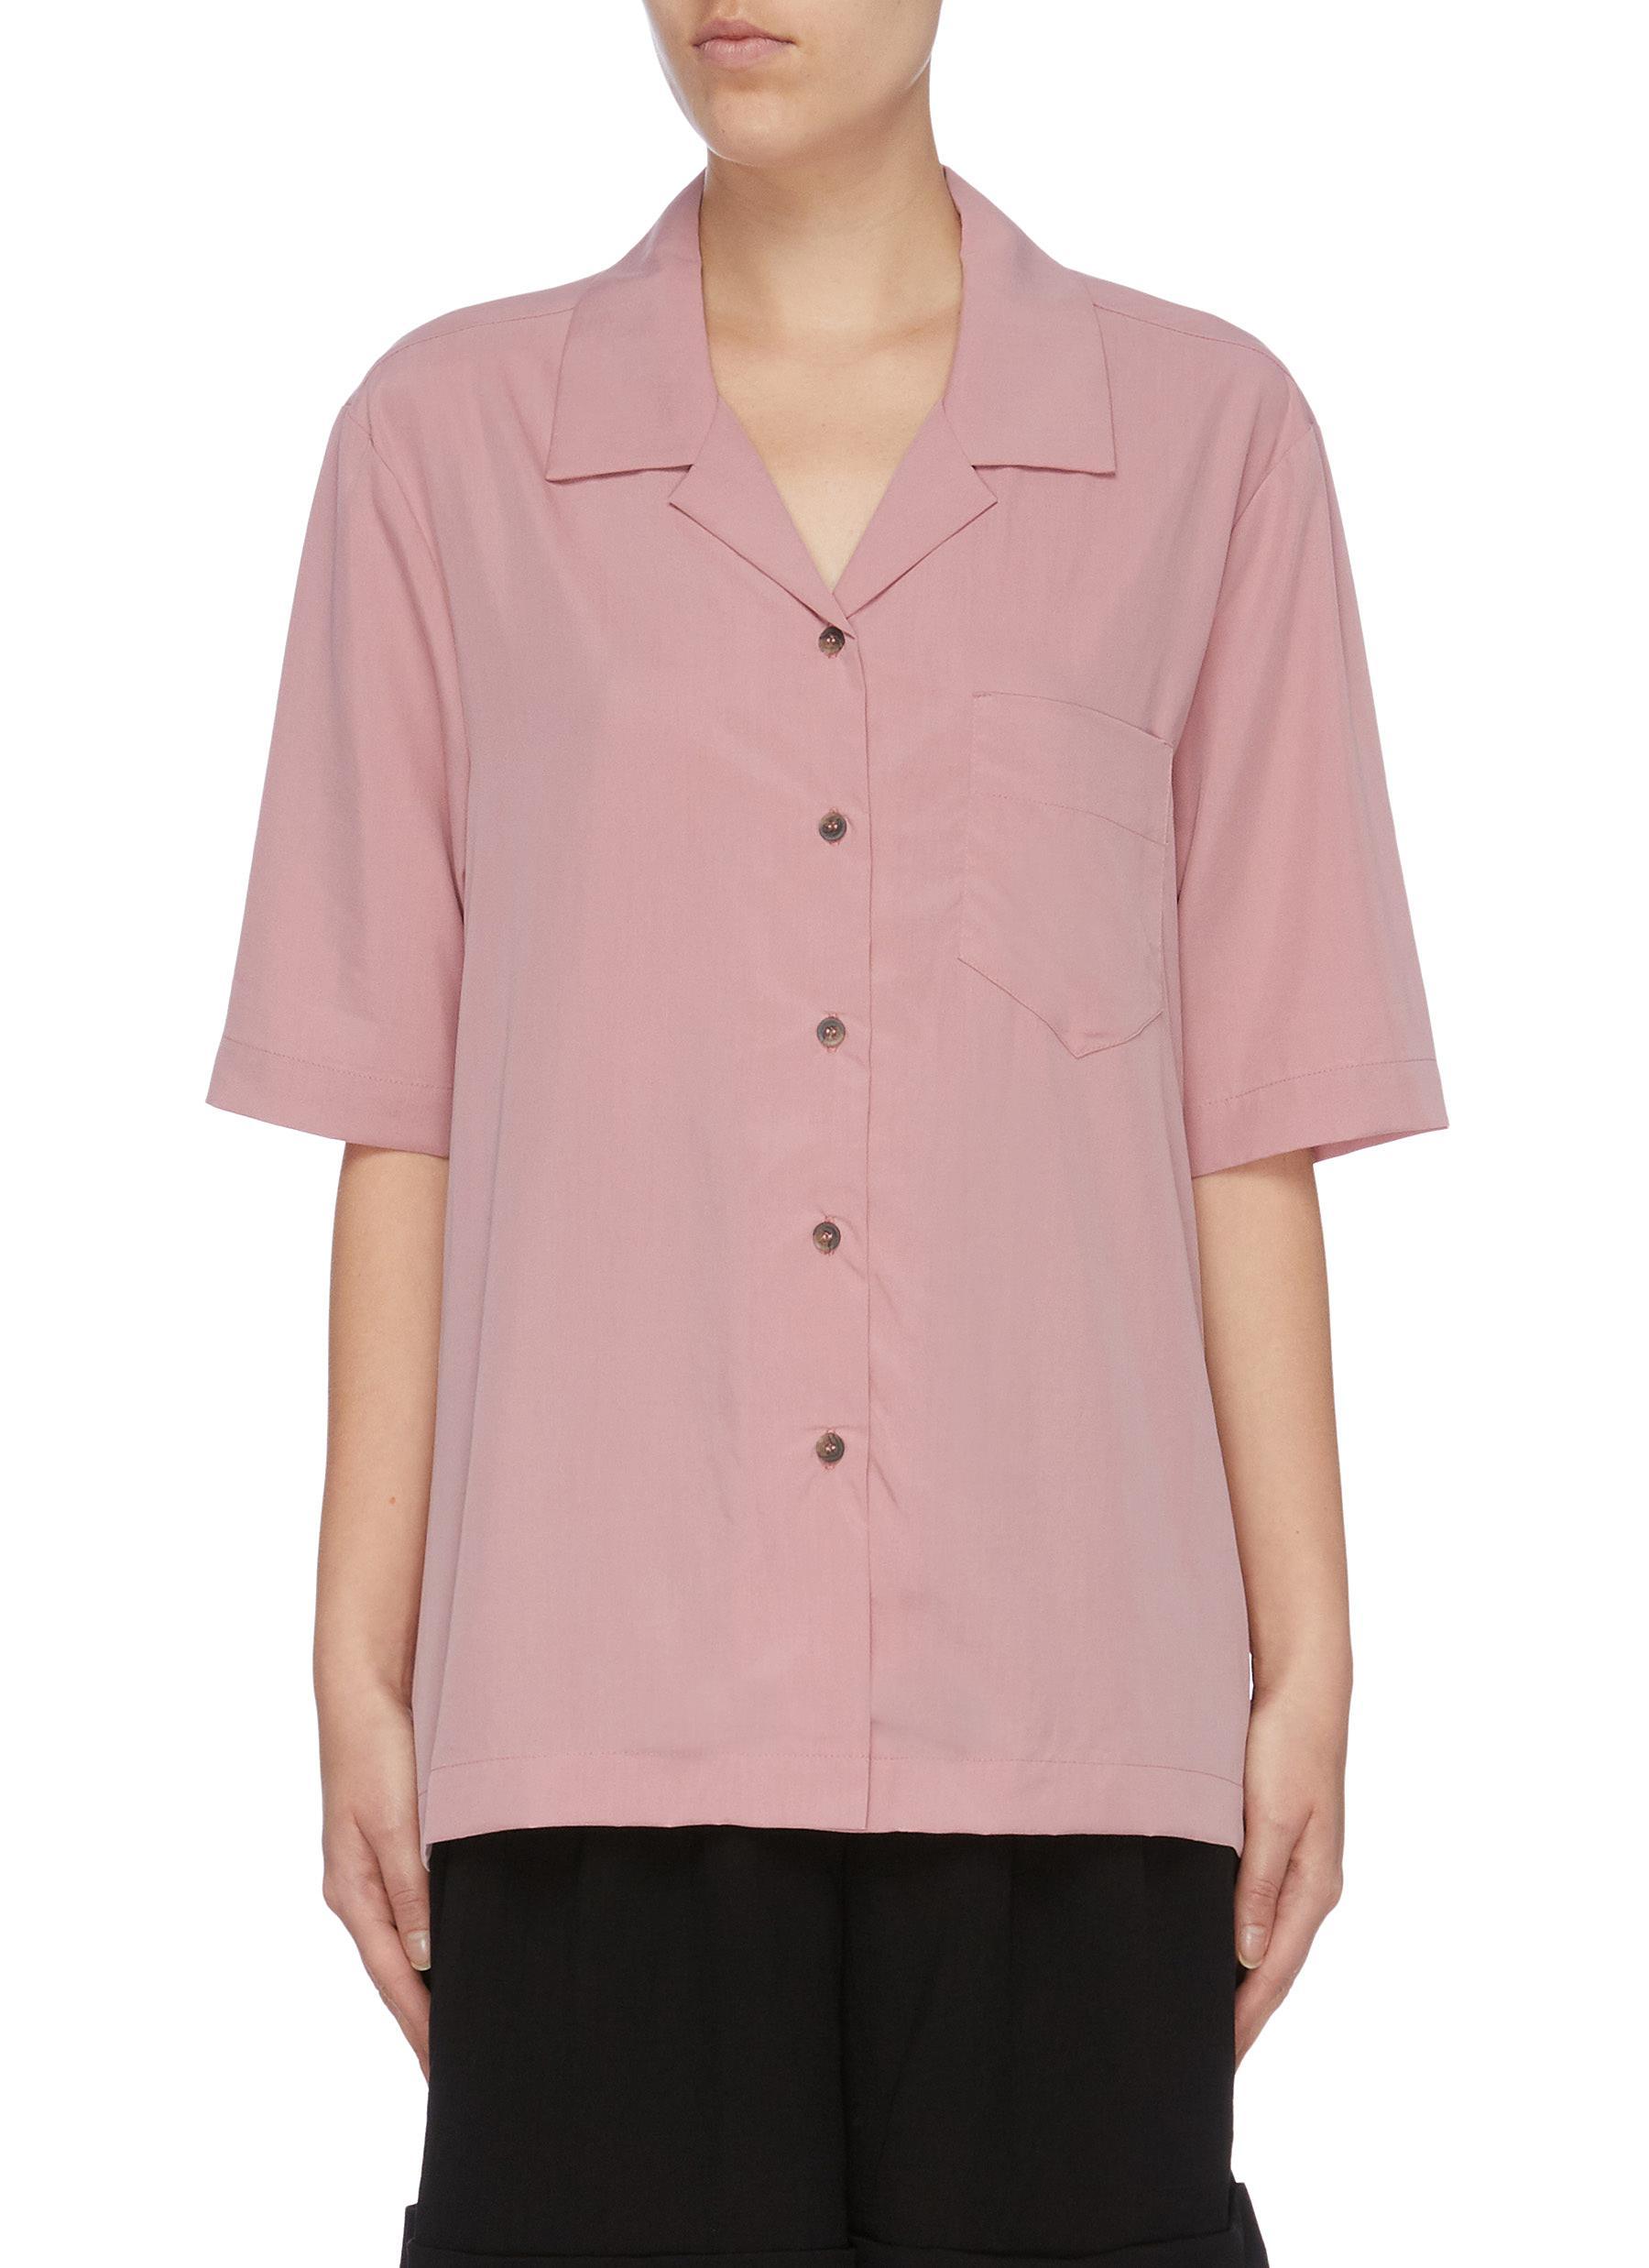 Naraz oversized shirt by Nanushka